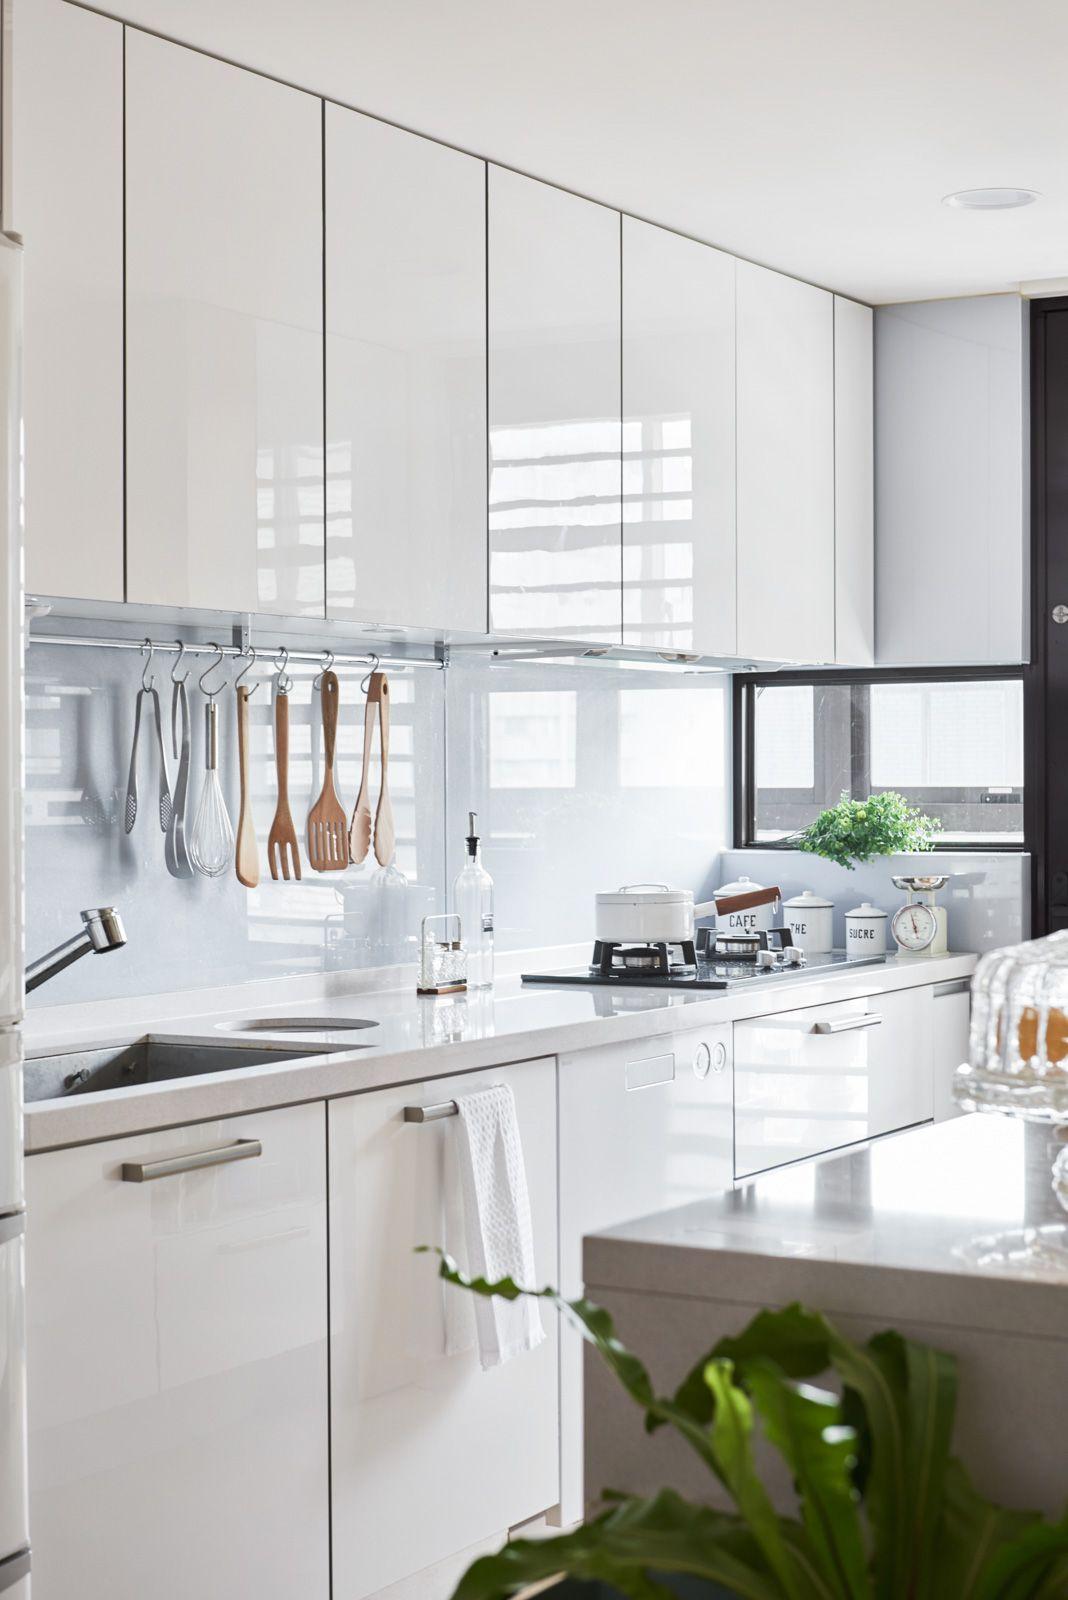 dsen real relax on behance ห องคร ว on kitchen interior japan id=36815